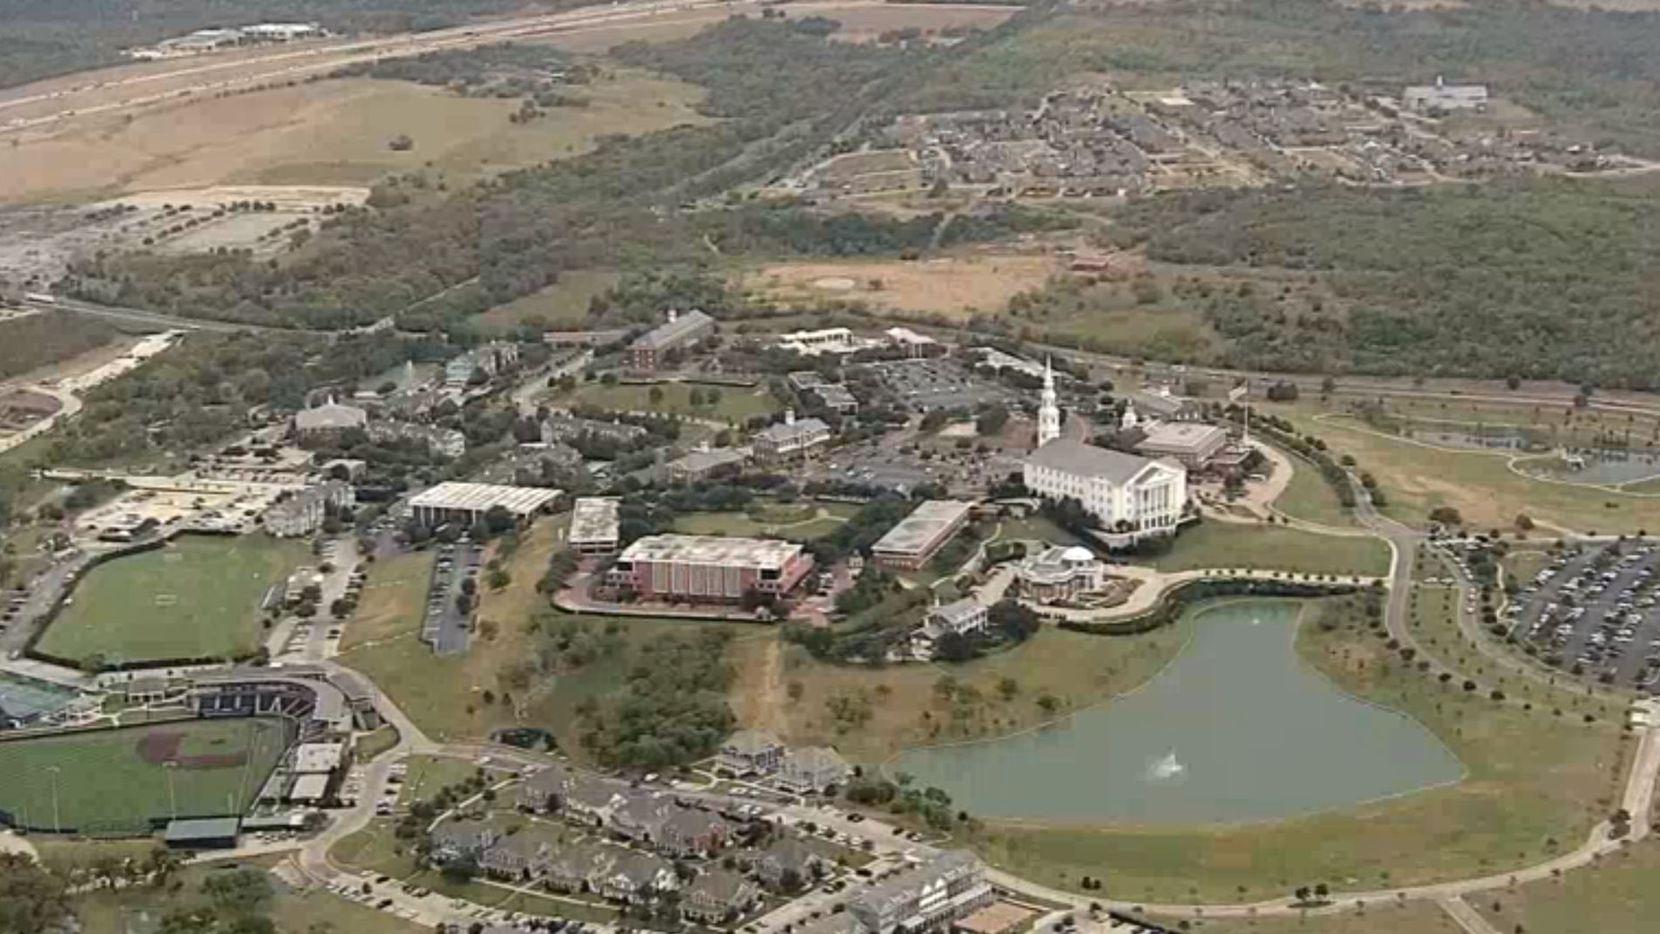 Aerial view of Dallas Baptist University.